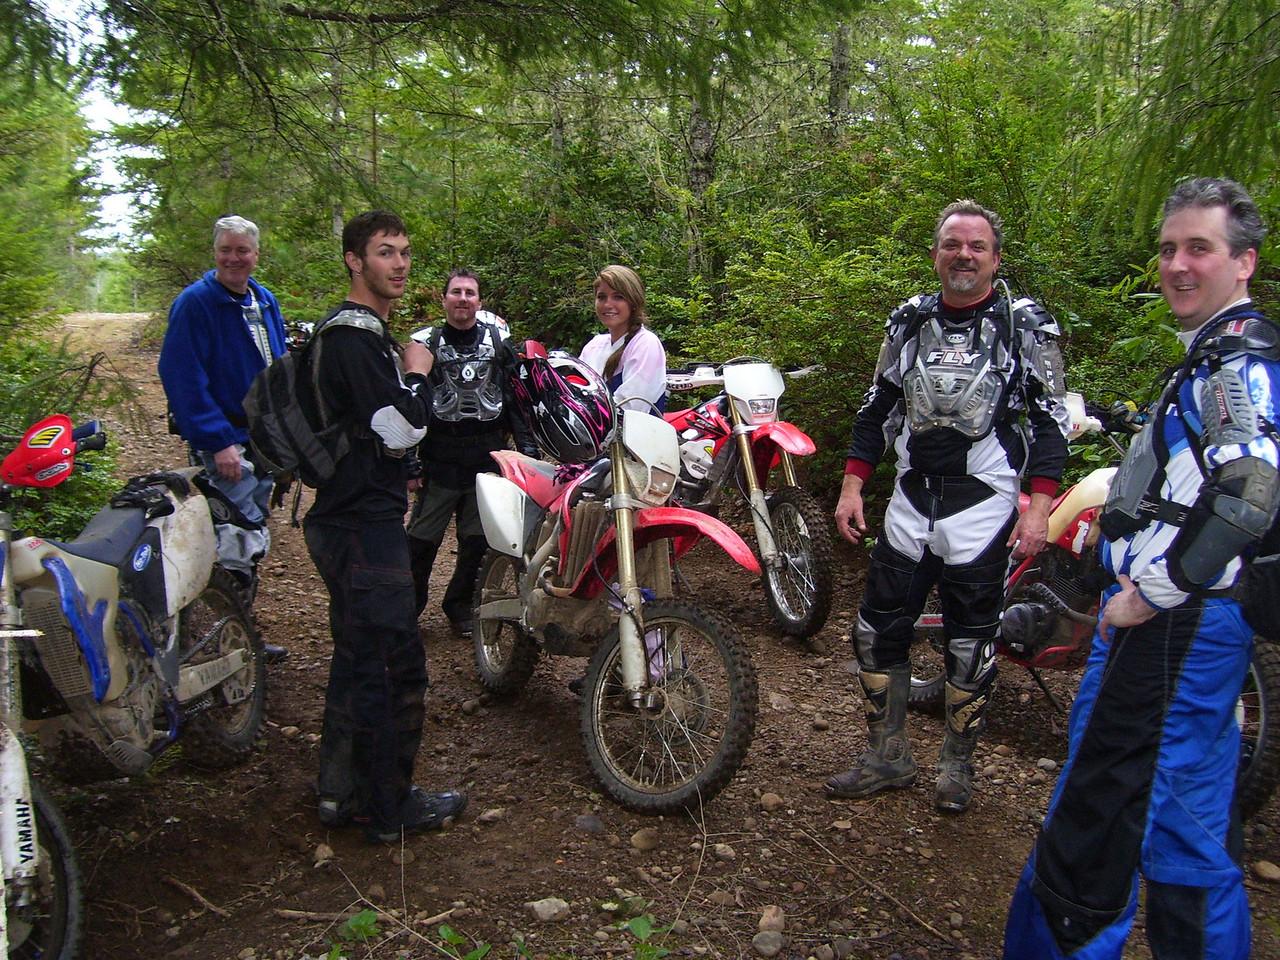 Wild Bill, Brandon, Dan, Julie, Marc, & Greg on a break. These trails are really fun.